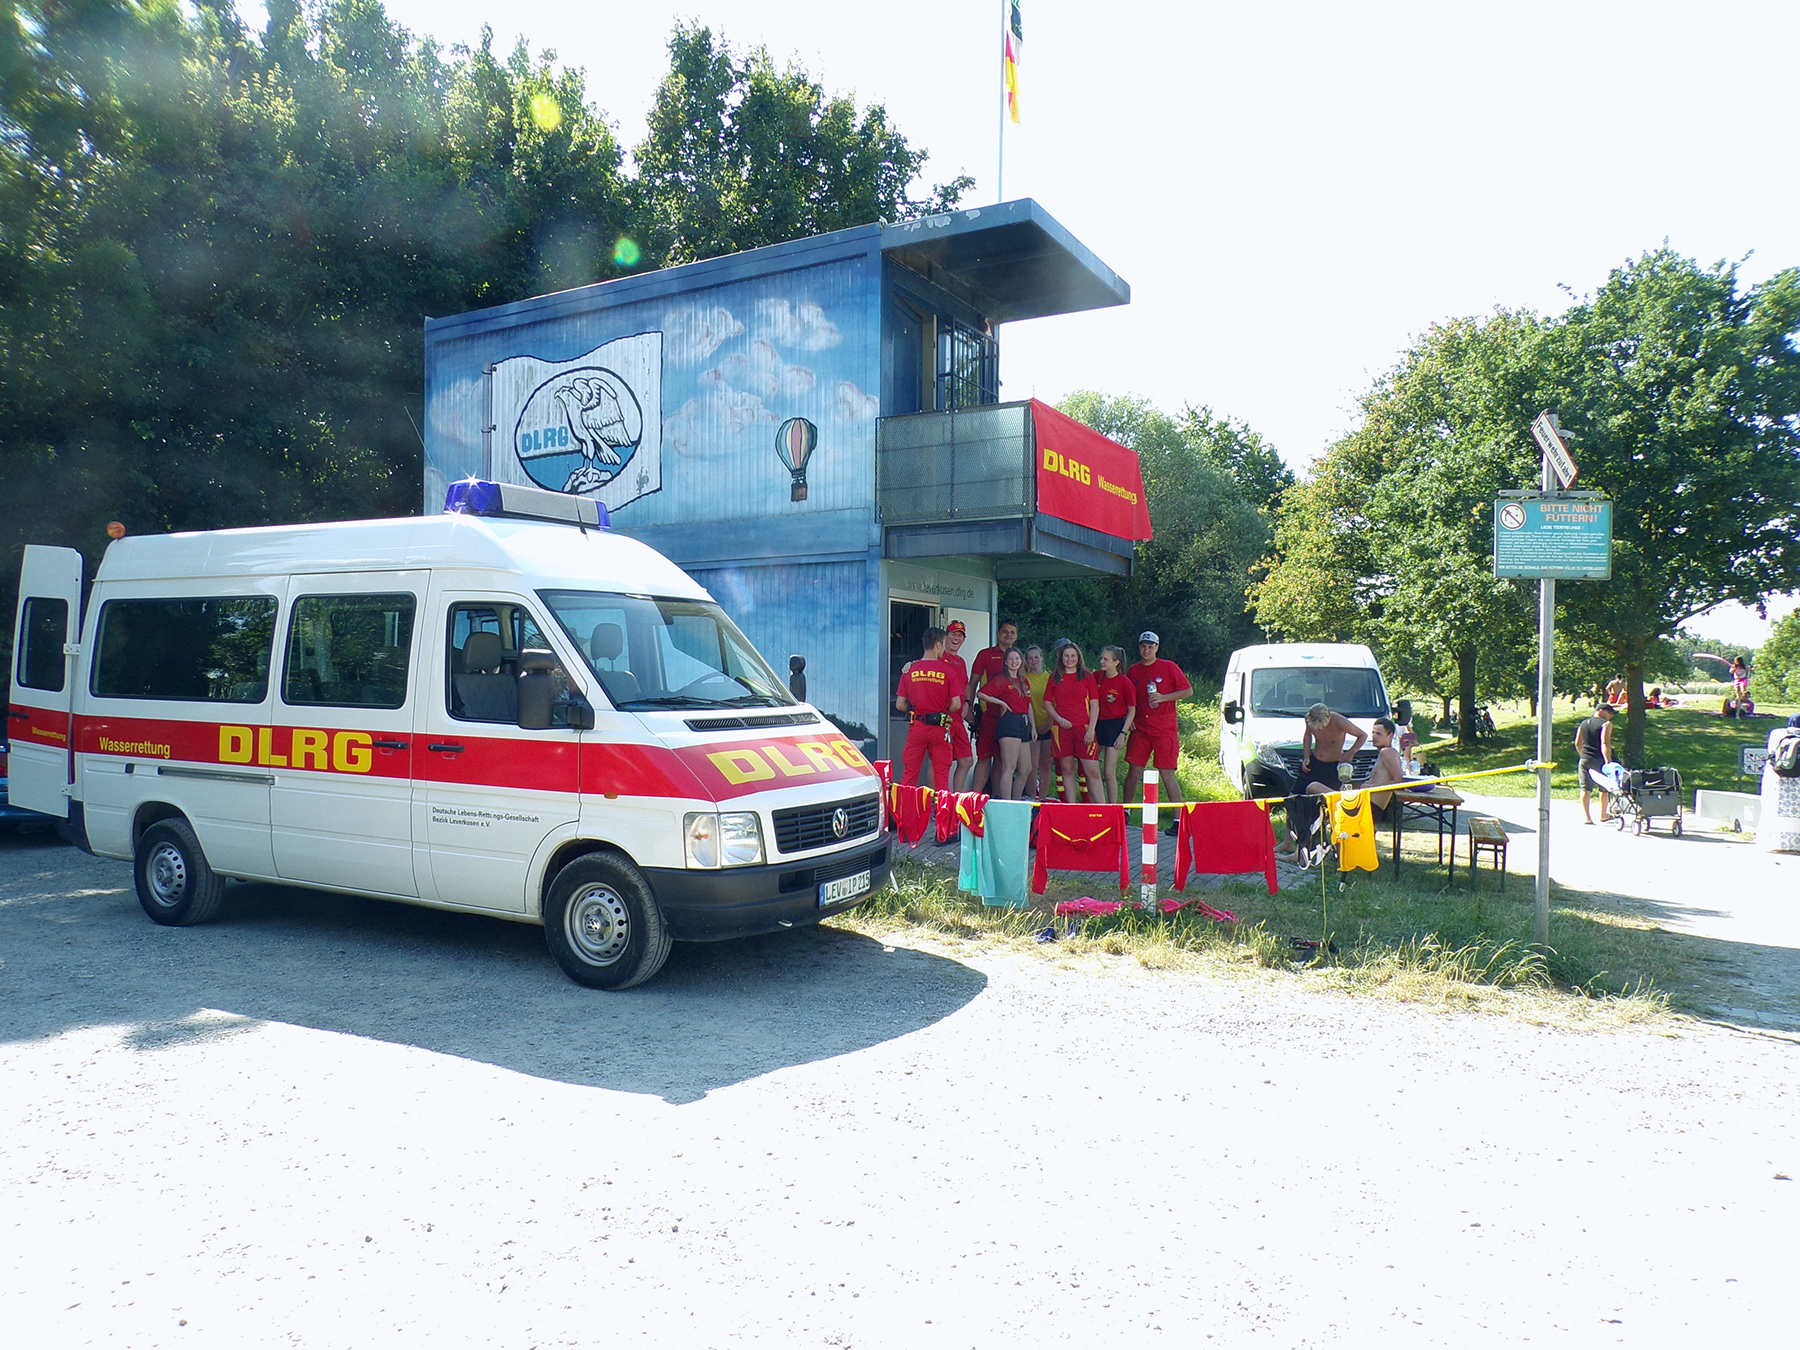 DLRG Leverkusen